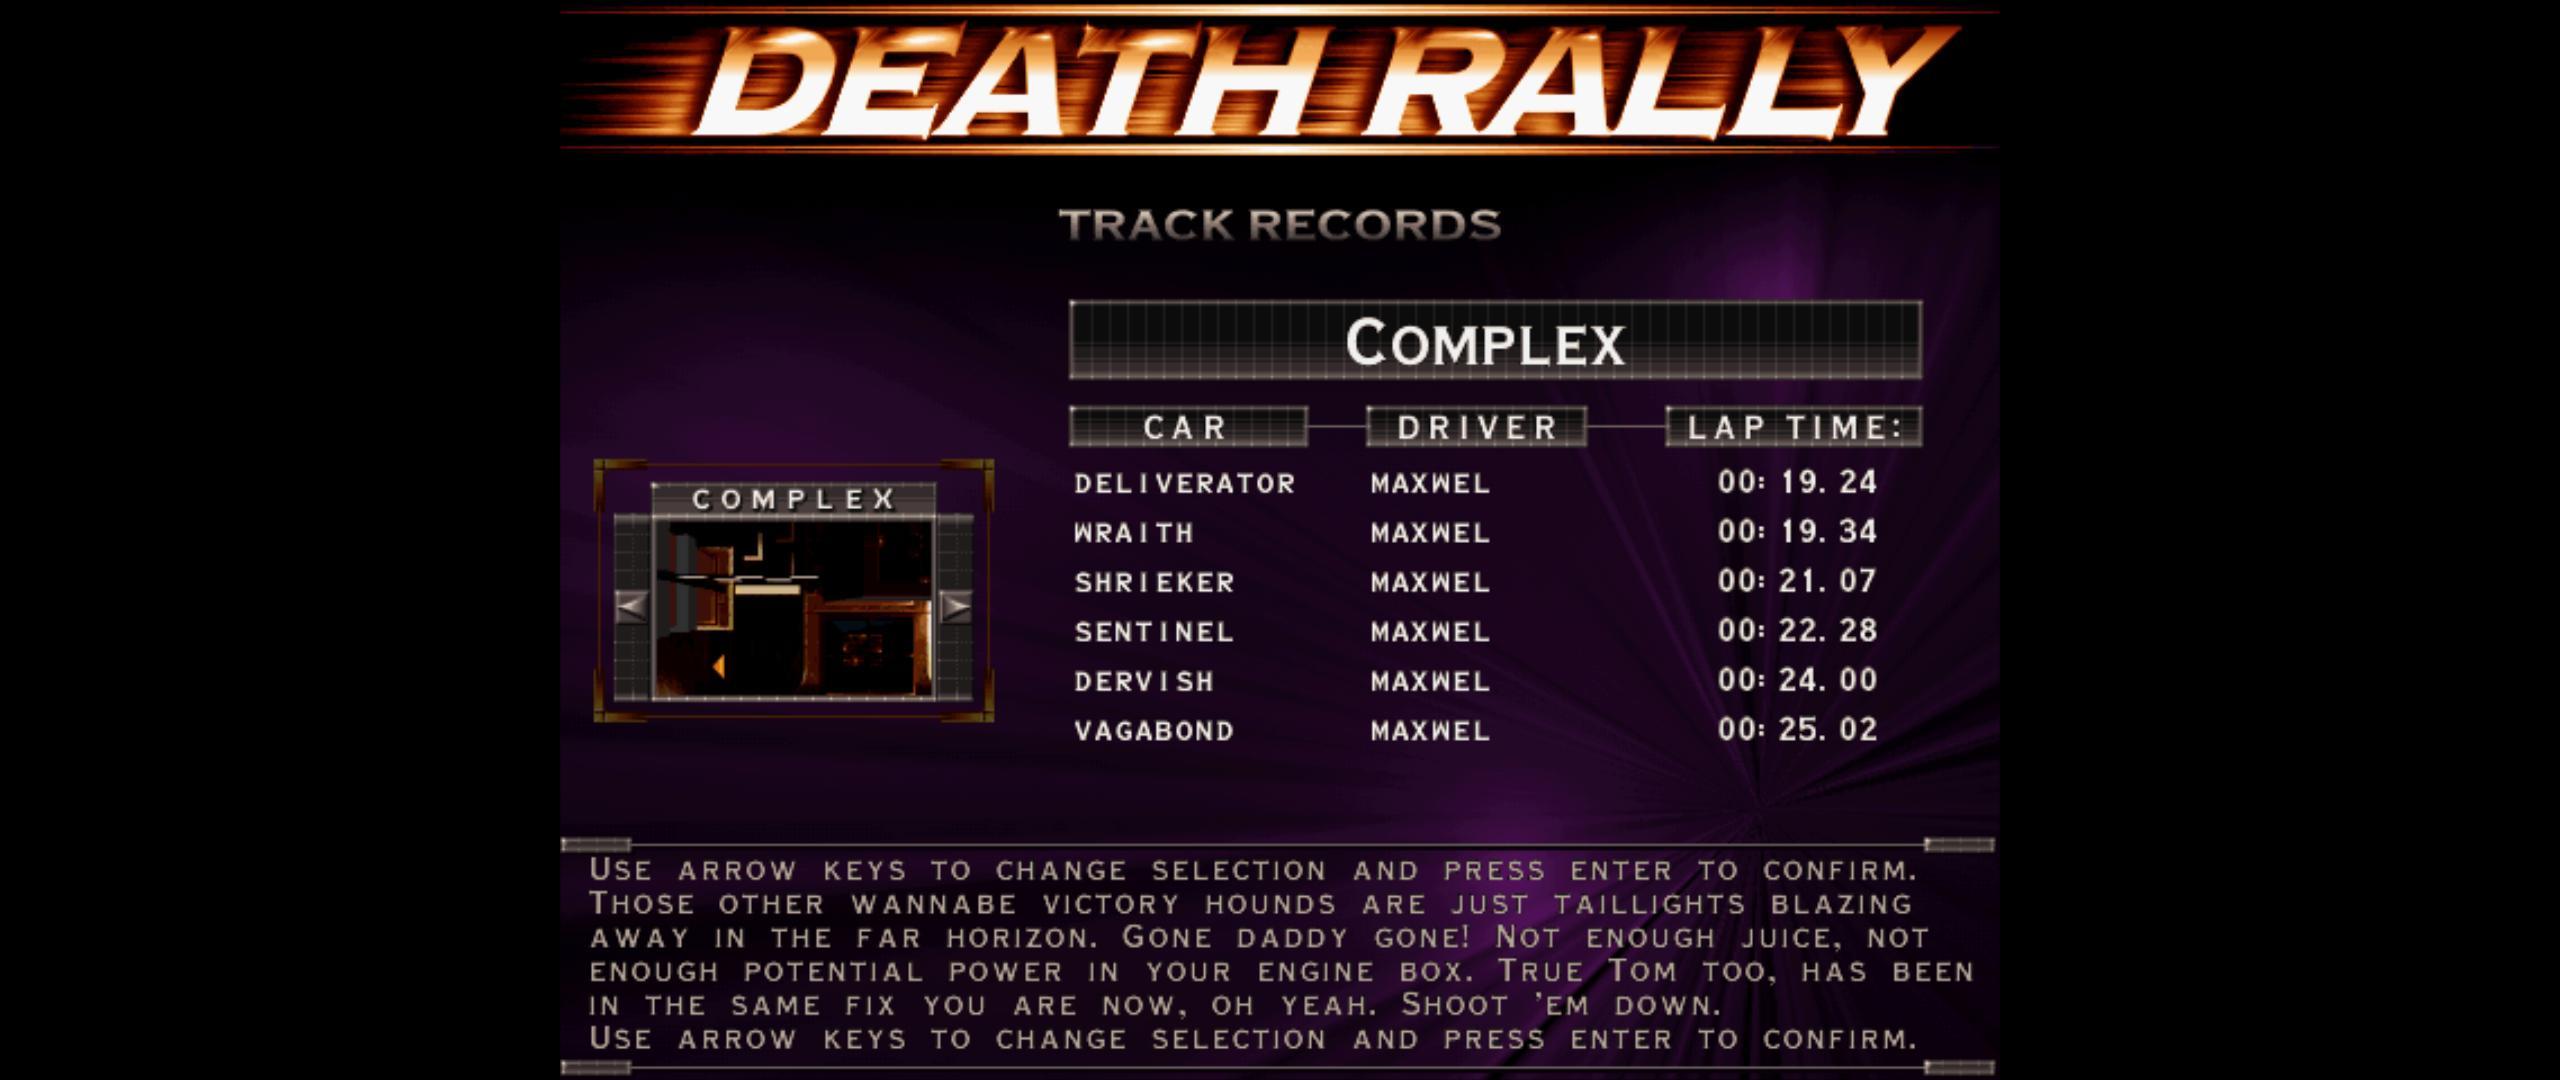 Maxwel: Death Rally [Complex, Dervish Car Car] (PC) 0:00:24 points on 2016-03-04 07:41:58